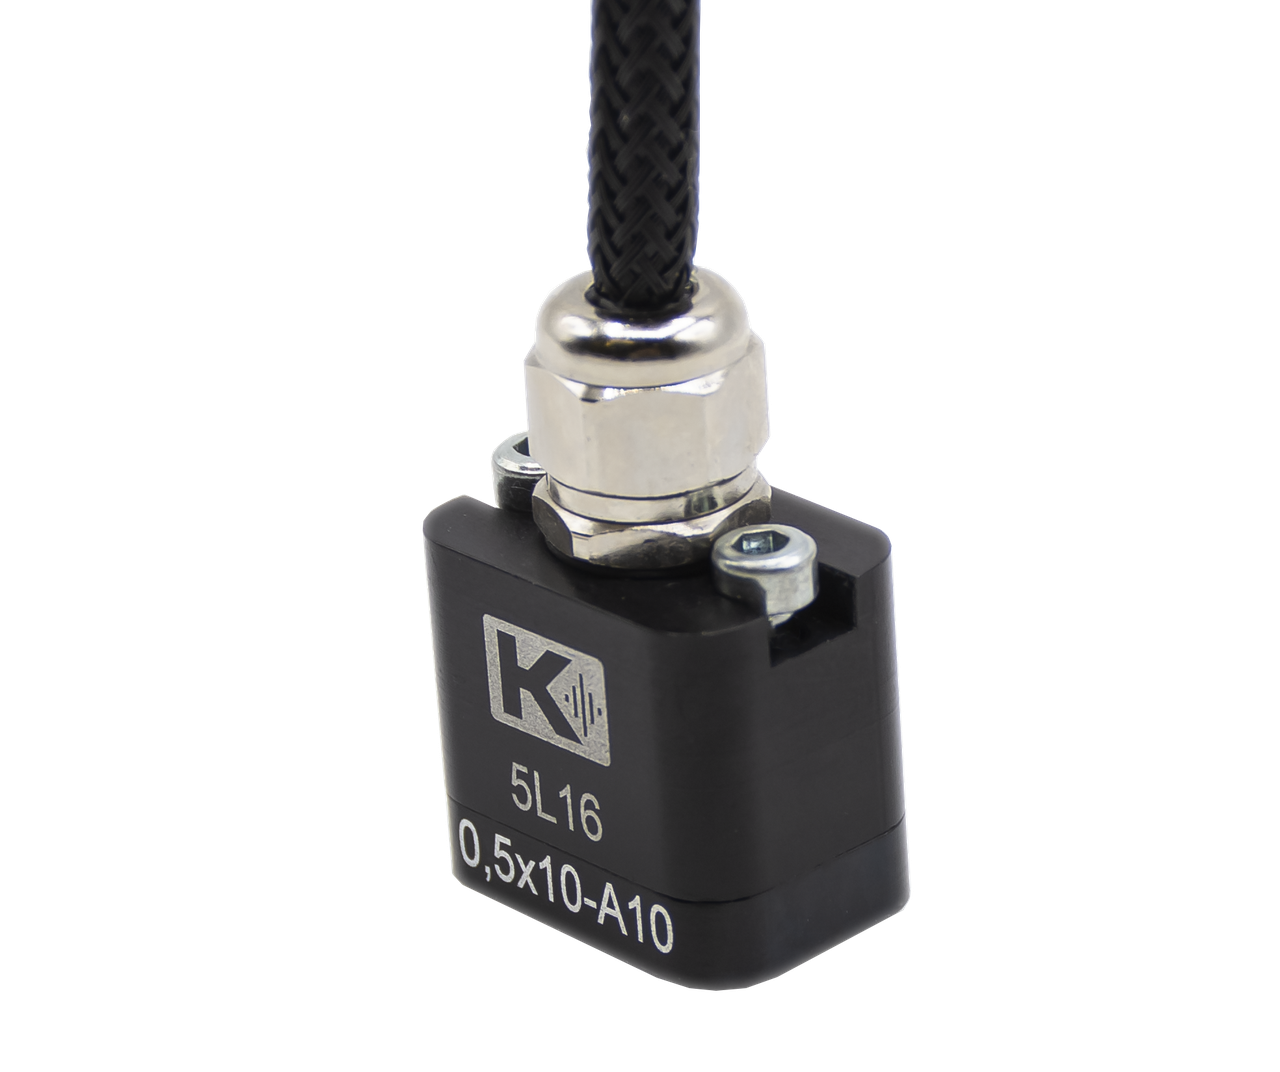 Фазированная антенная решетка 5L16-0,5х10-A10, 16 эл, 5 МГц